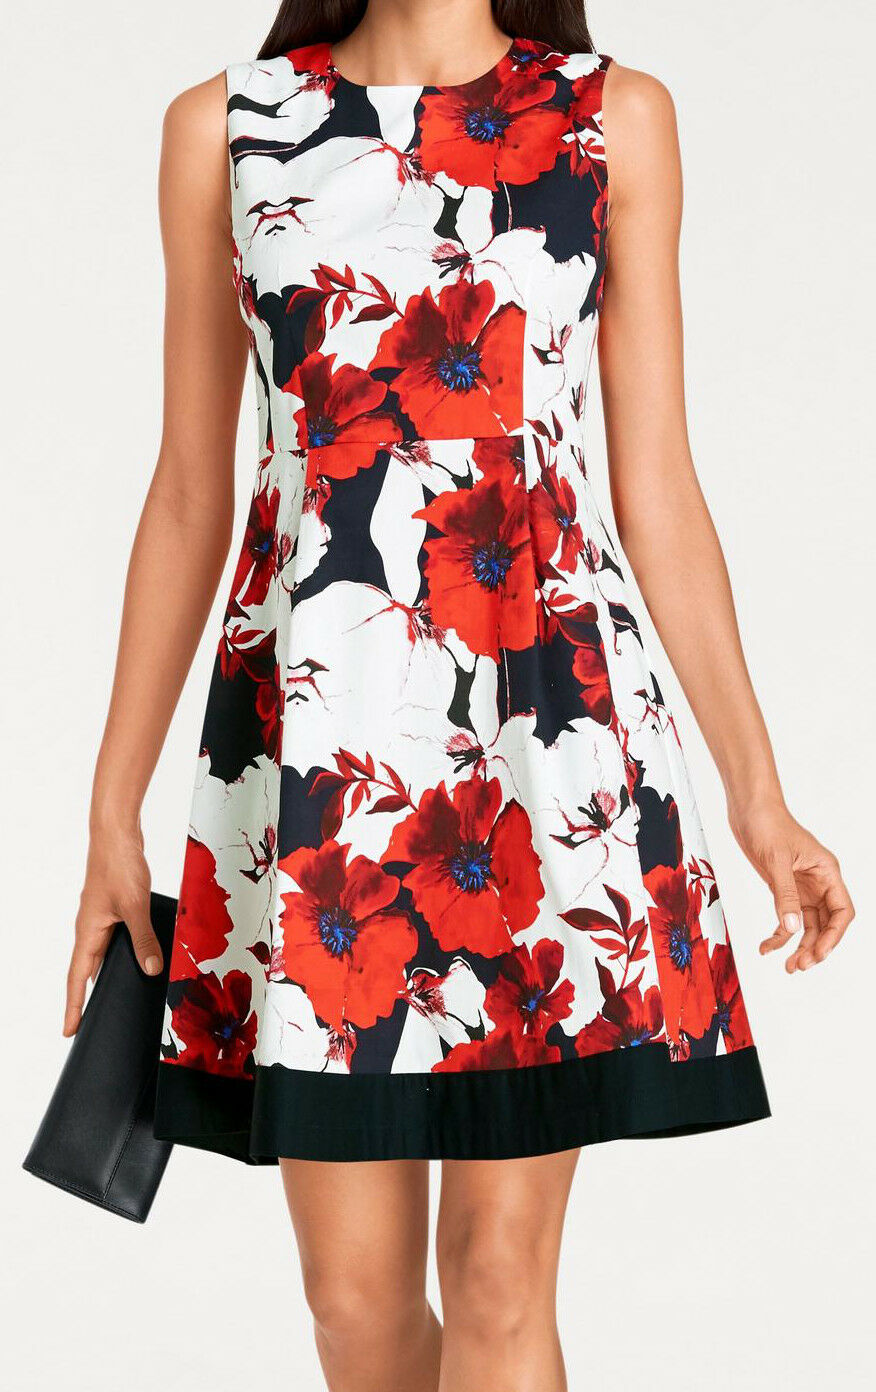 Sommerkleid rot weiß 36 Blaumen Ashley Brooke Heine Mohn schwarz Kleid EDEL NP